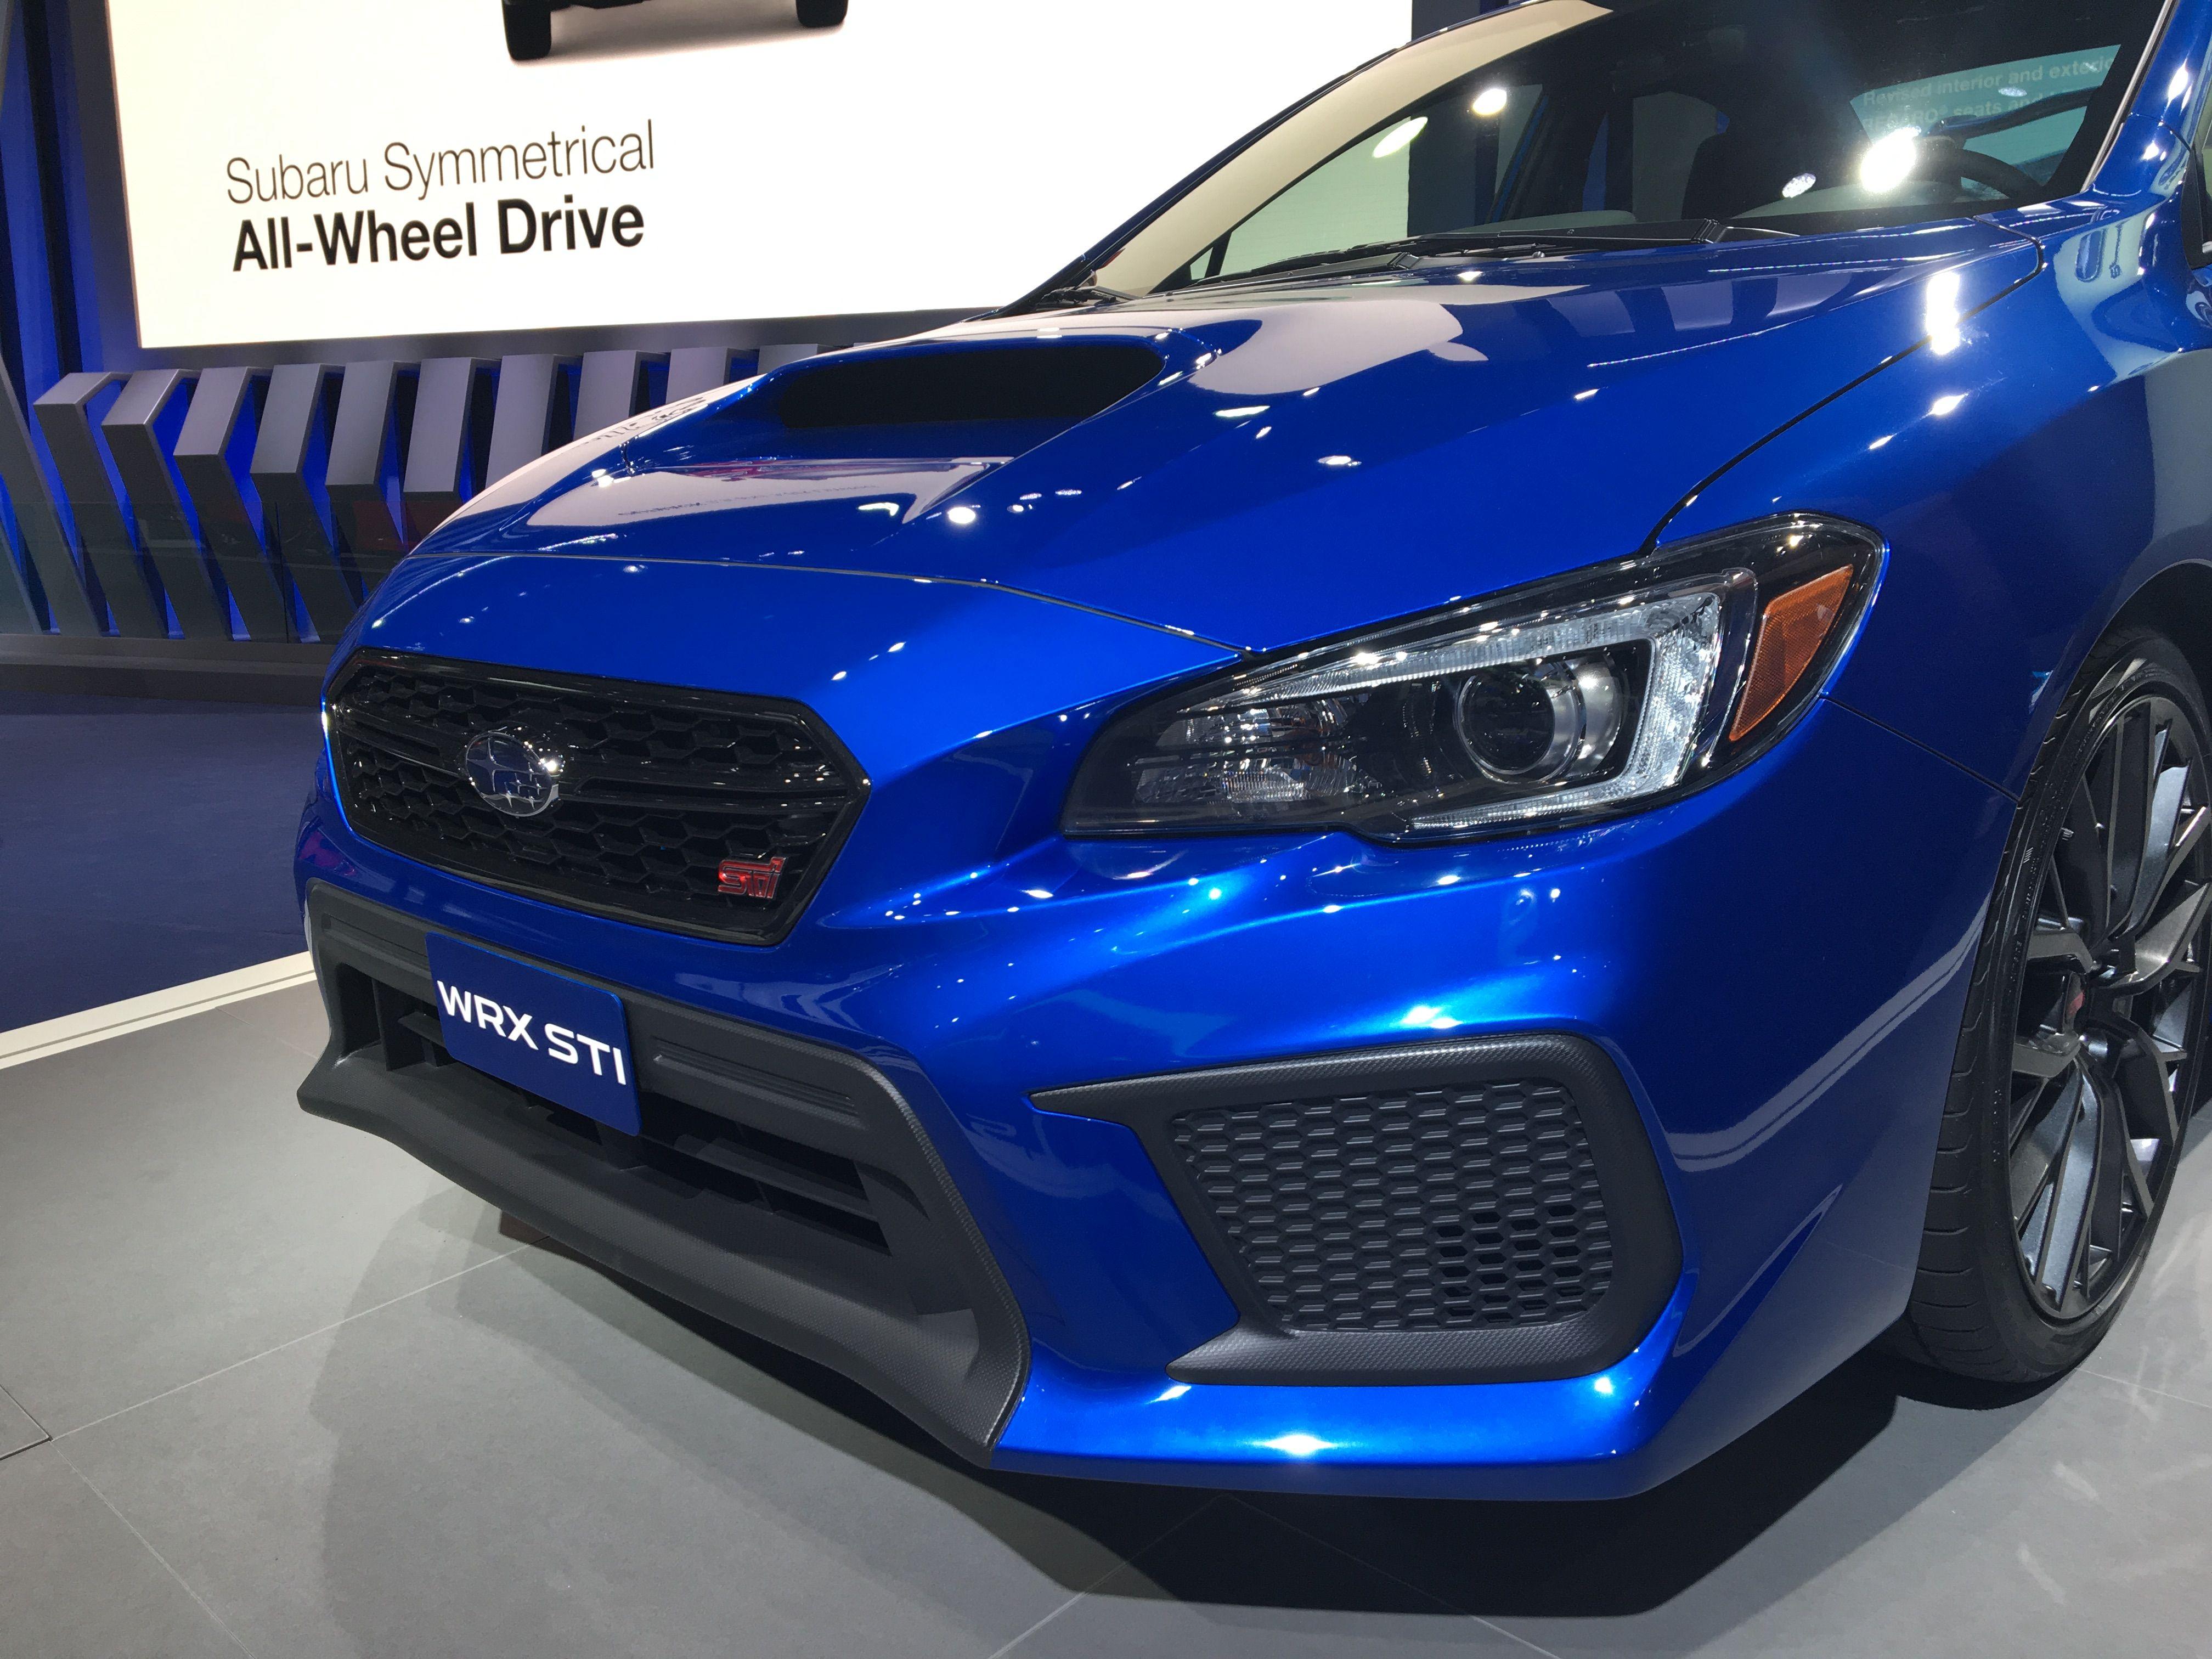 The newly redesigned 2018 subaru wrx sti